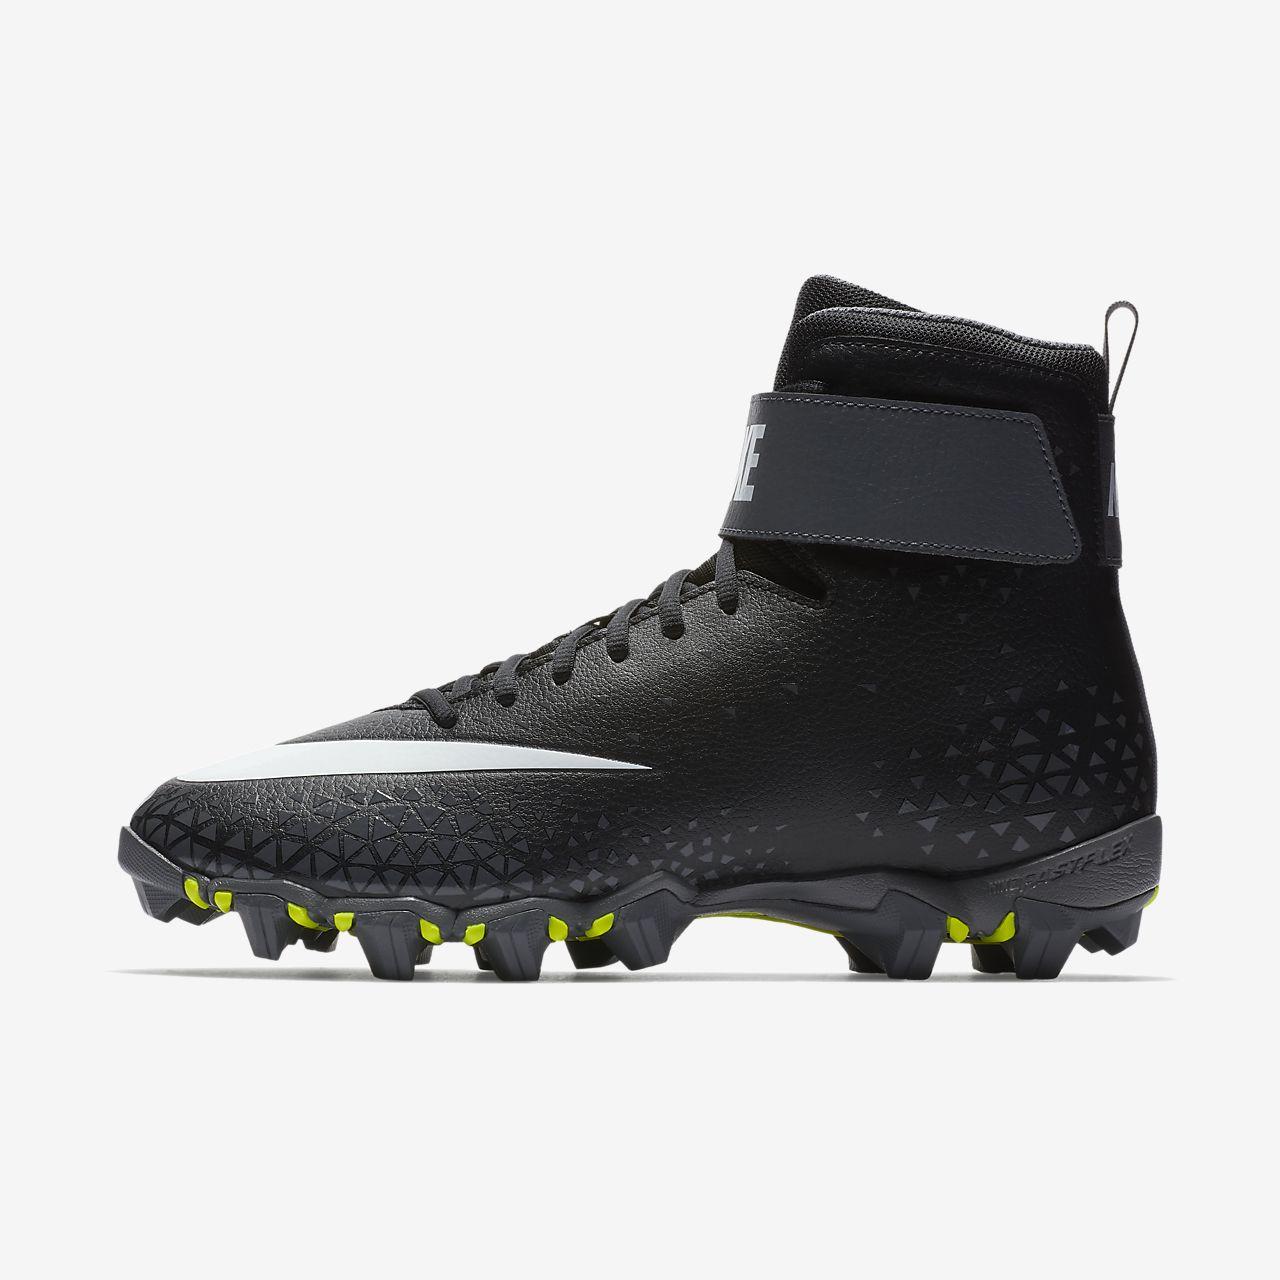 a3bc150d35926 Nike Force Savage Shark Football Cleat. Nike.com